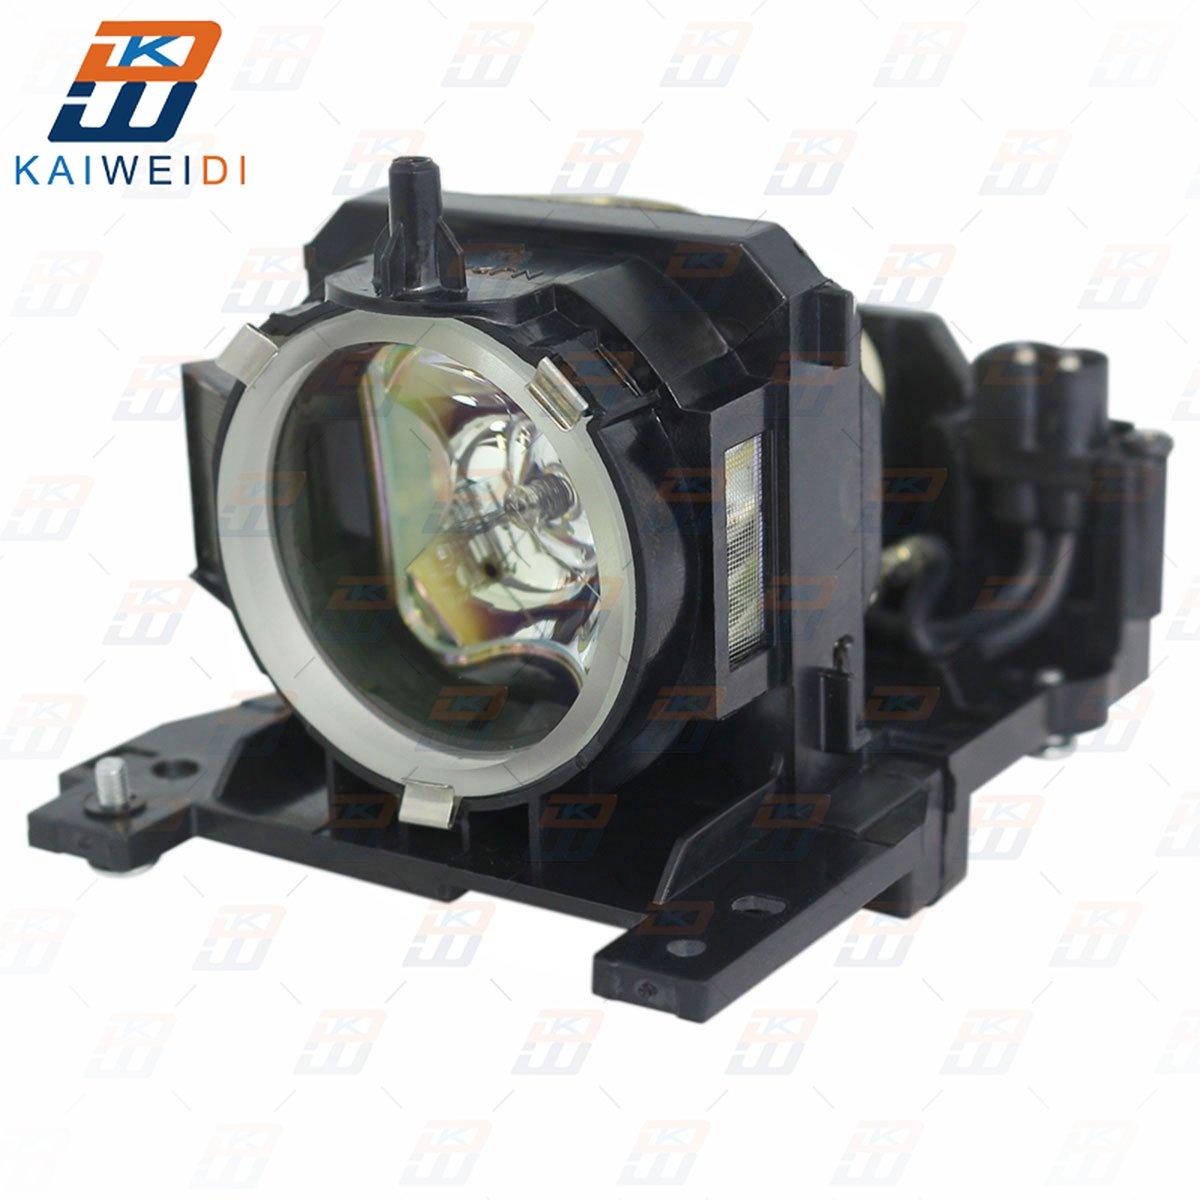 DT00911 CP-WX400 CP-WX410 CP-X201 CP-X206 CP-X301 CP-X306 CP-X401 CP-X450 CP-X467 CP-ED-X31 CP-X33 Projector Lamp For HITACHI